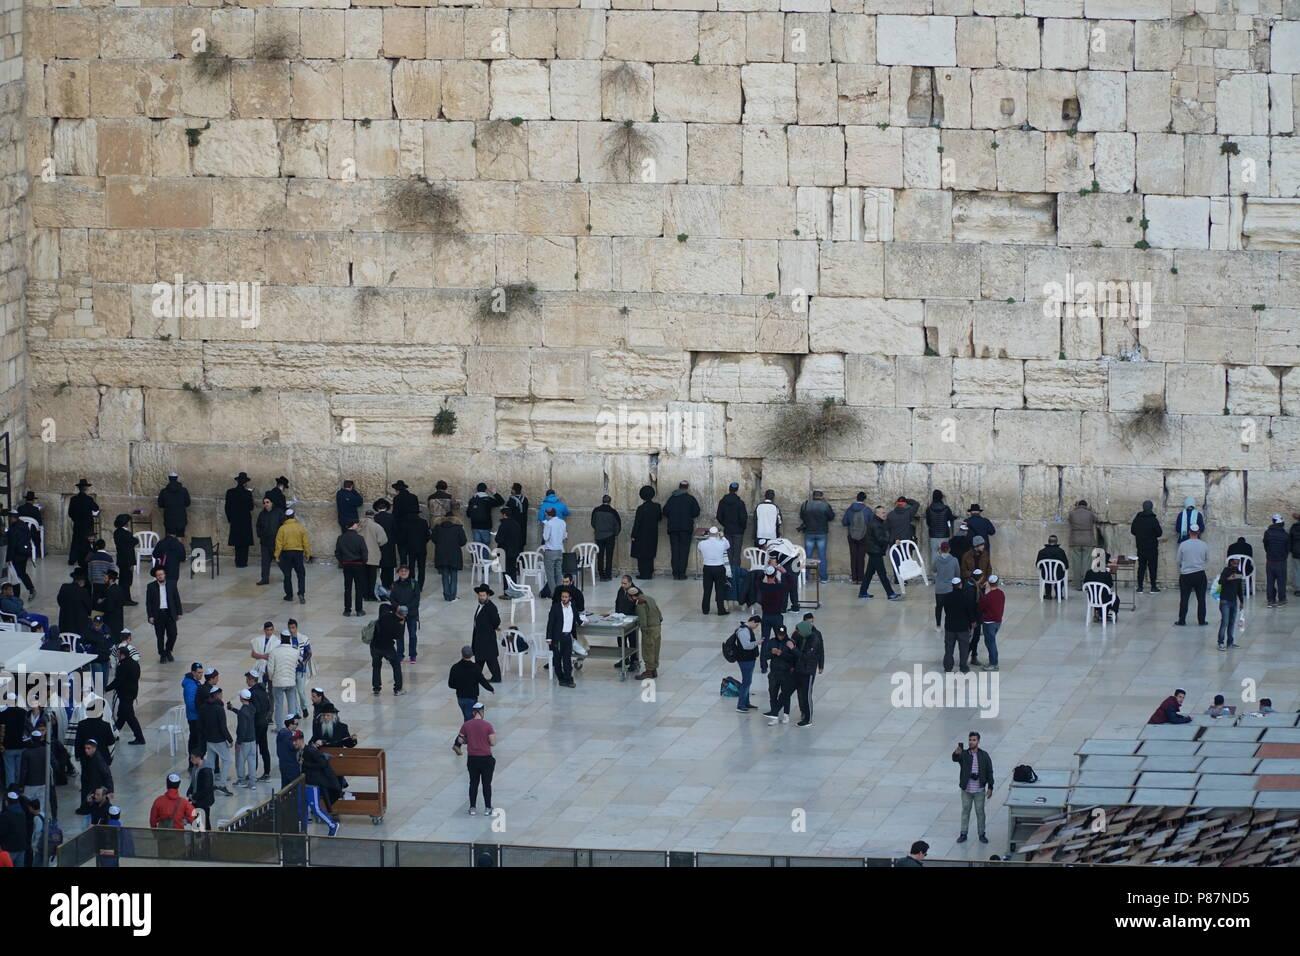 Jerusalem, praying at the wailing wall - Stock Image